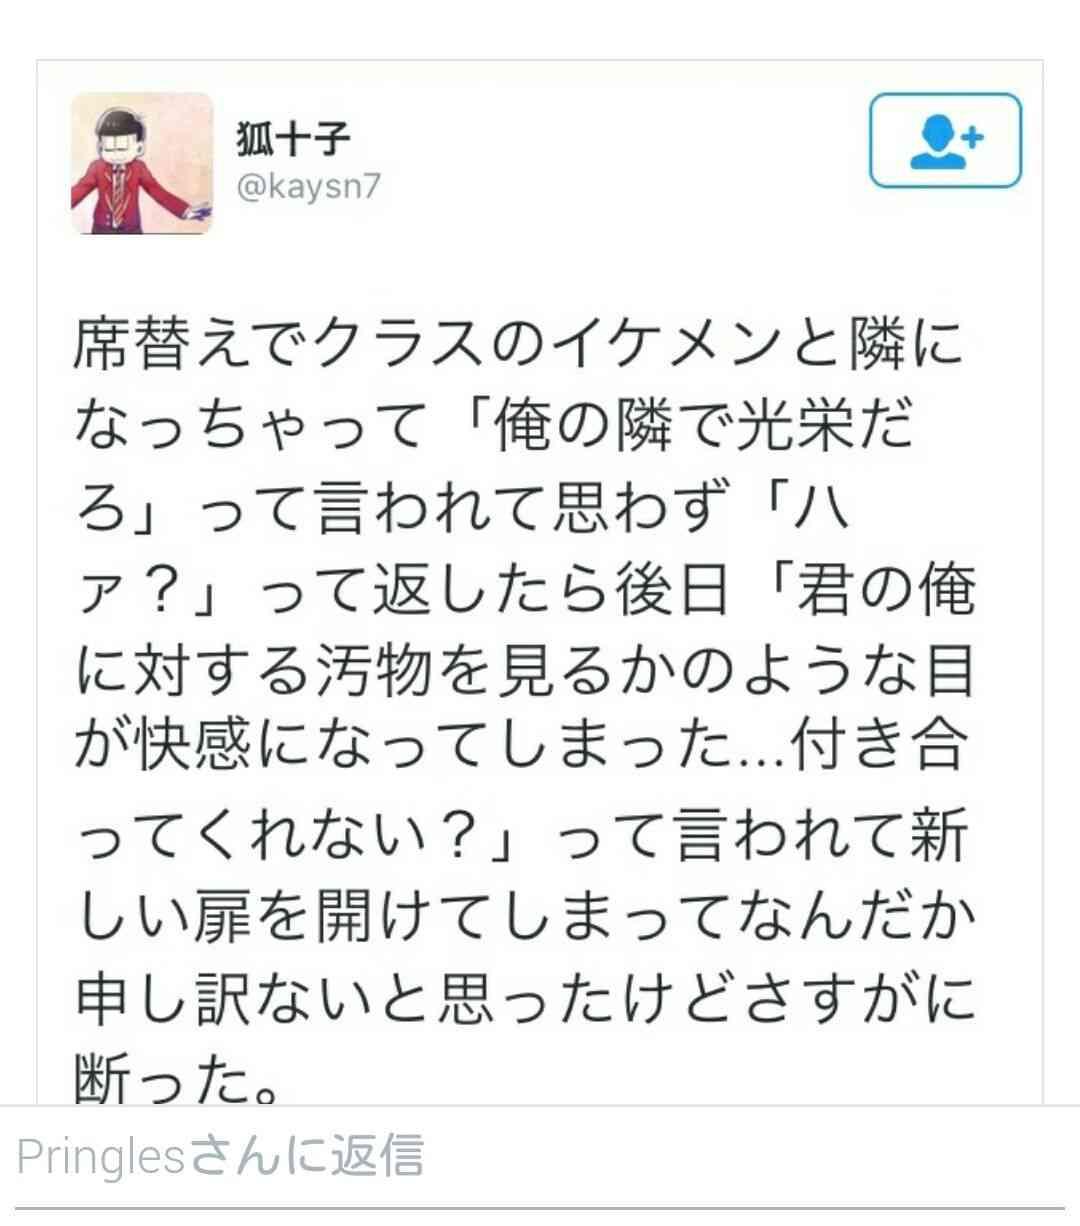 【腐女子厳禁】腐女子 BLが苦手な人